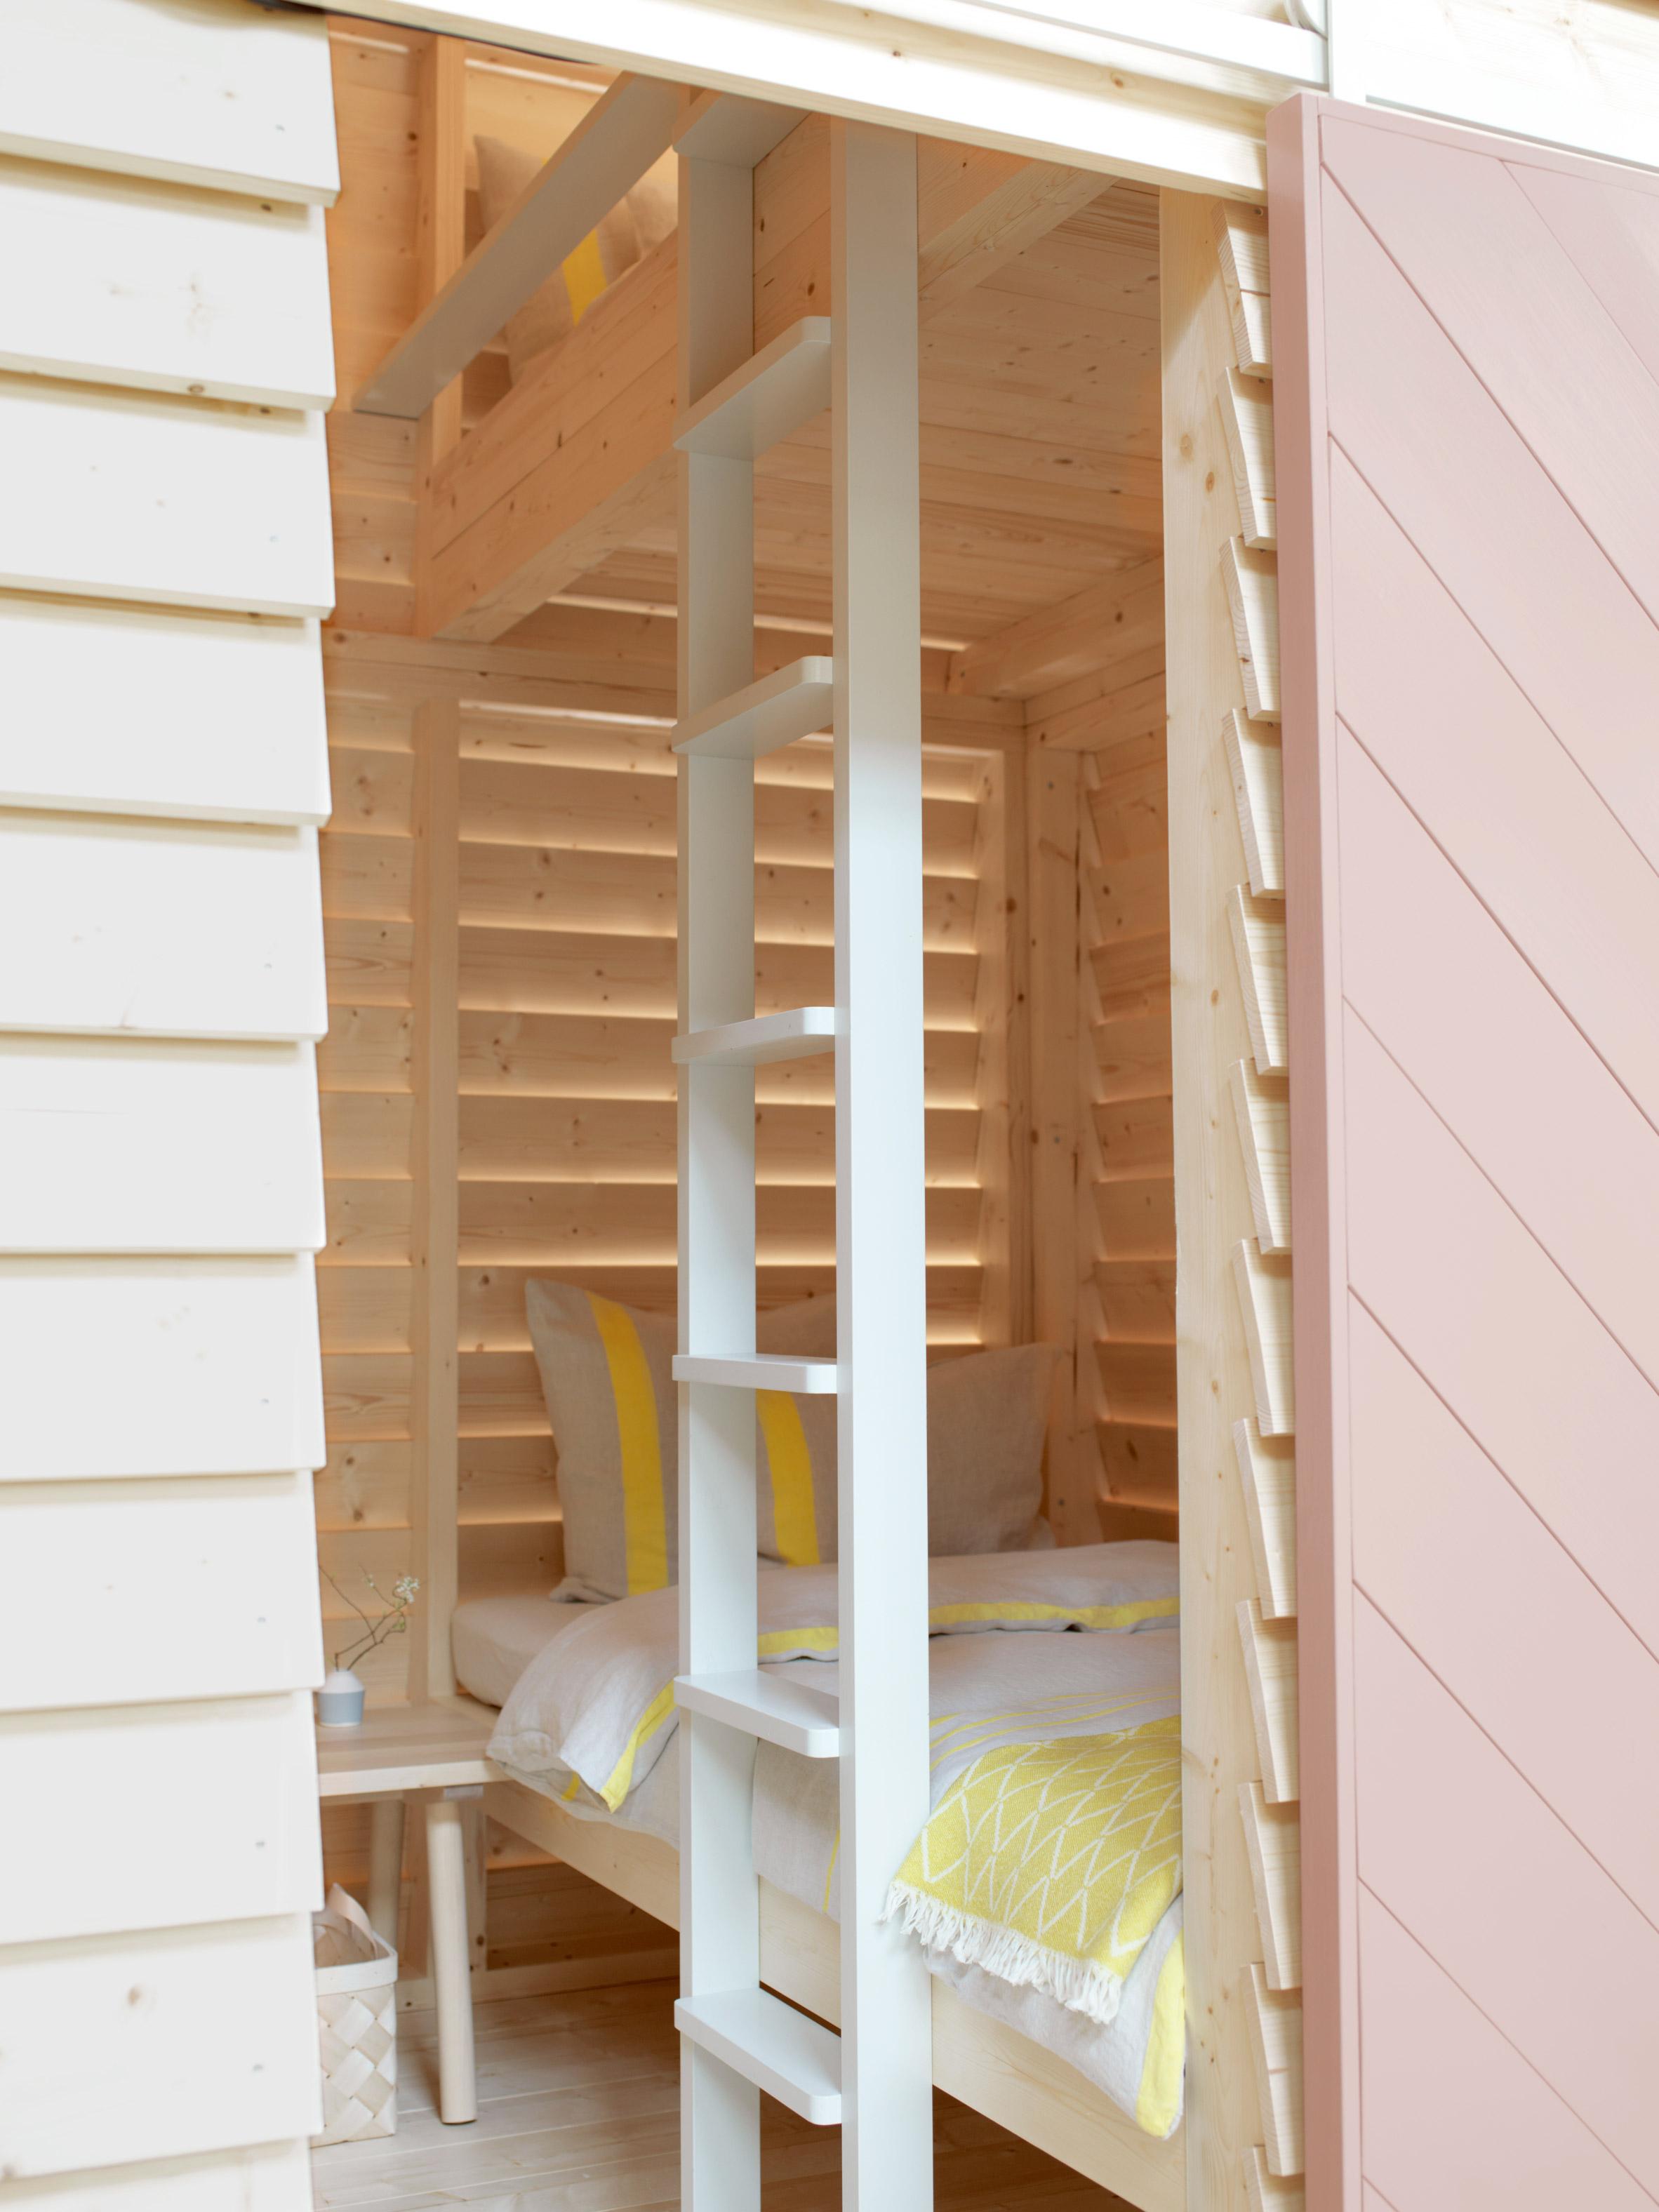 koti-popup-hotel-interiors-paris_dezeen_2364_col_8